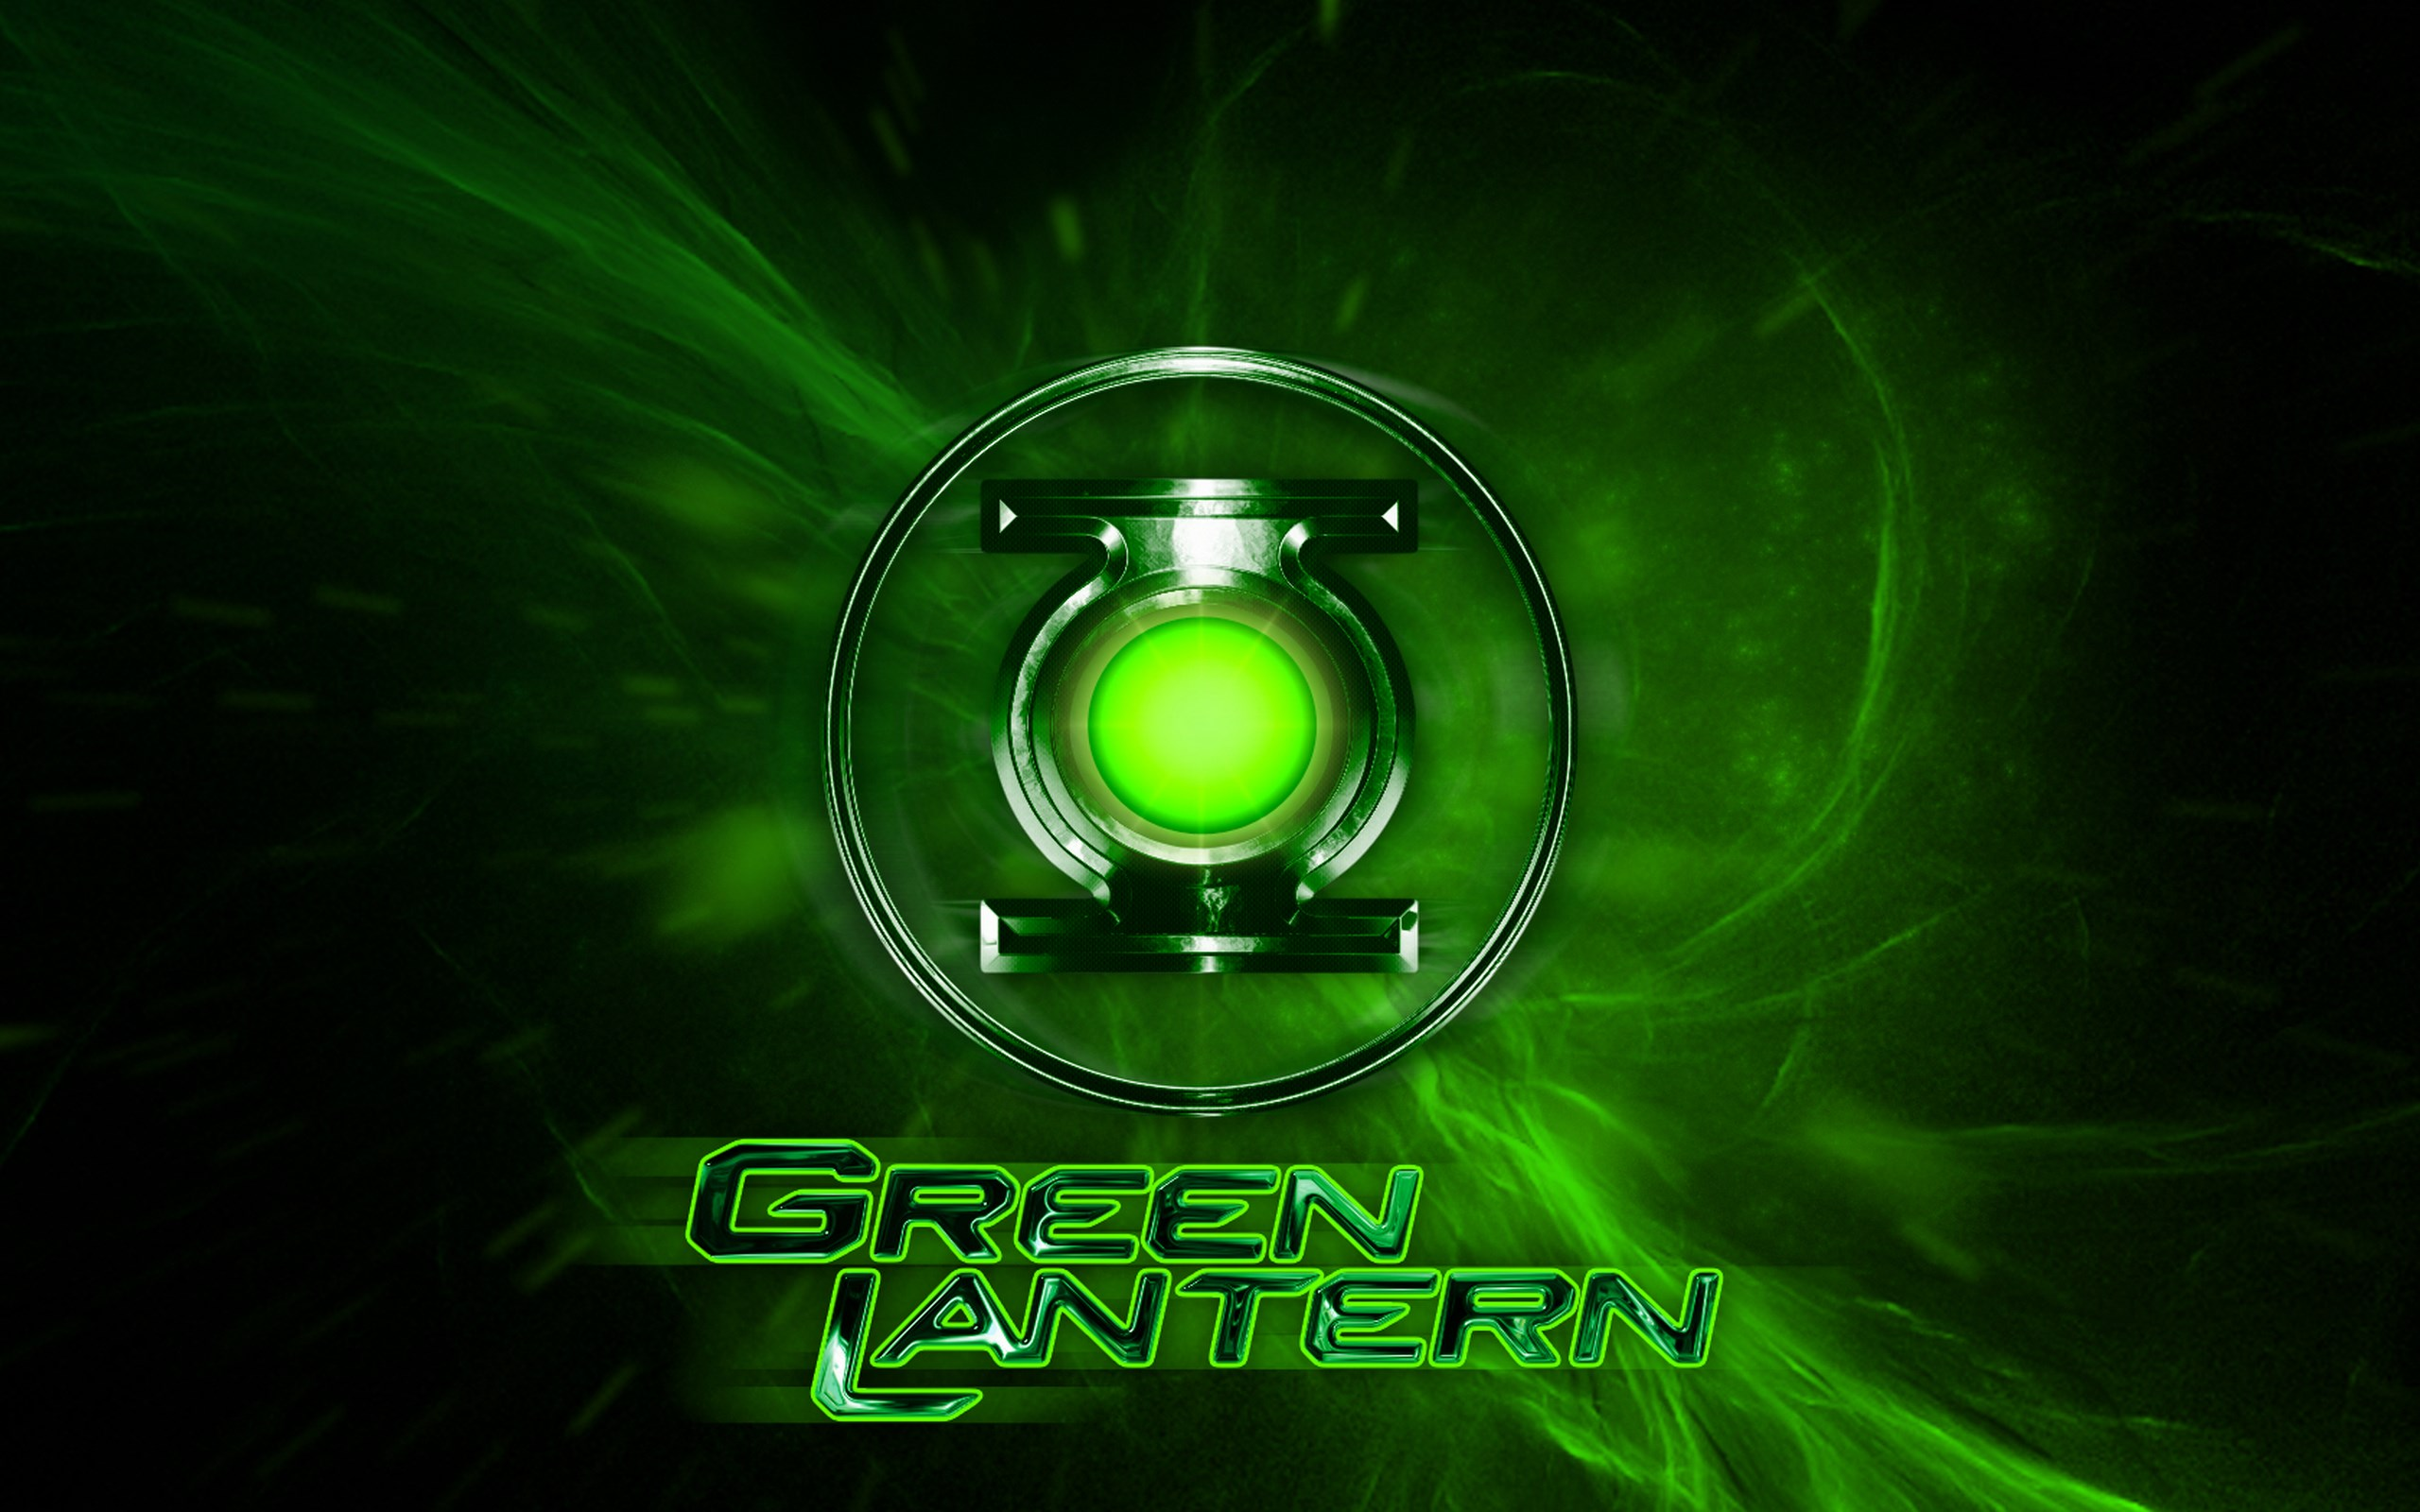 Green Lantern HD Wallpapers